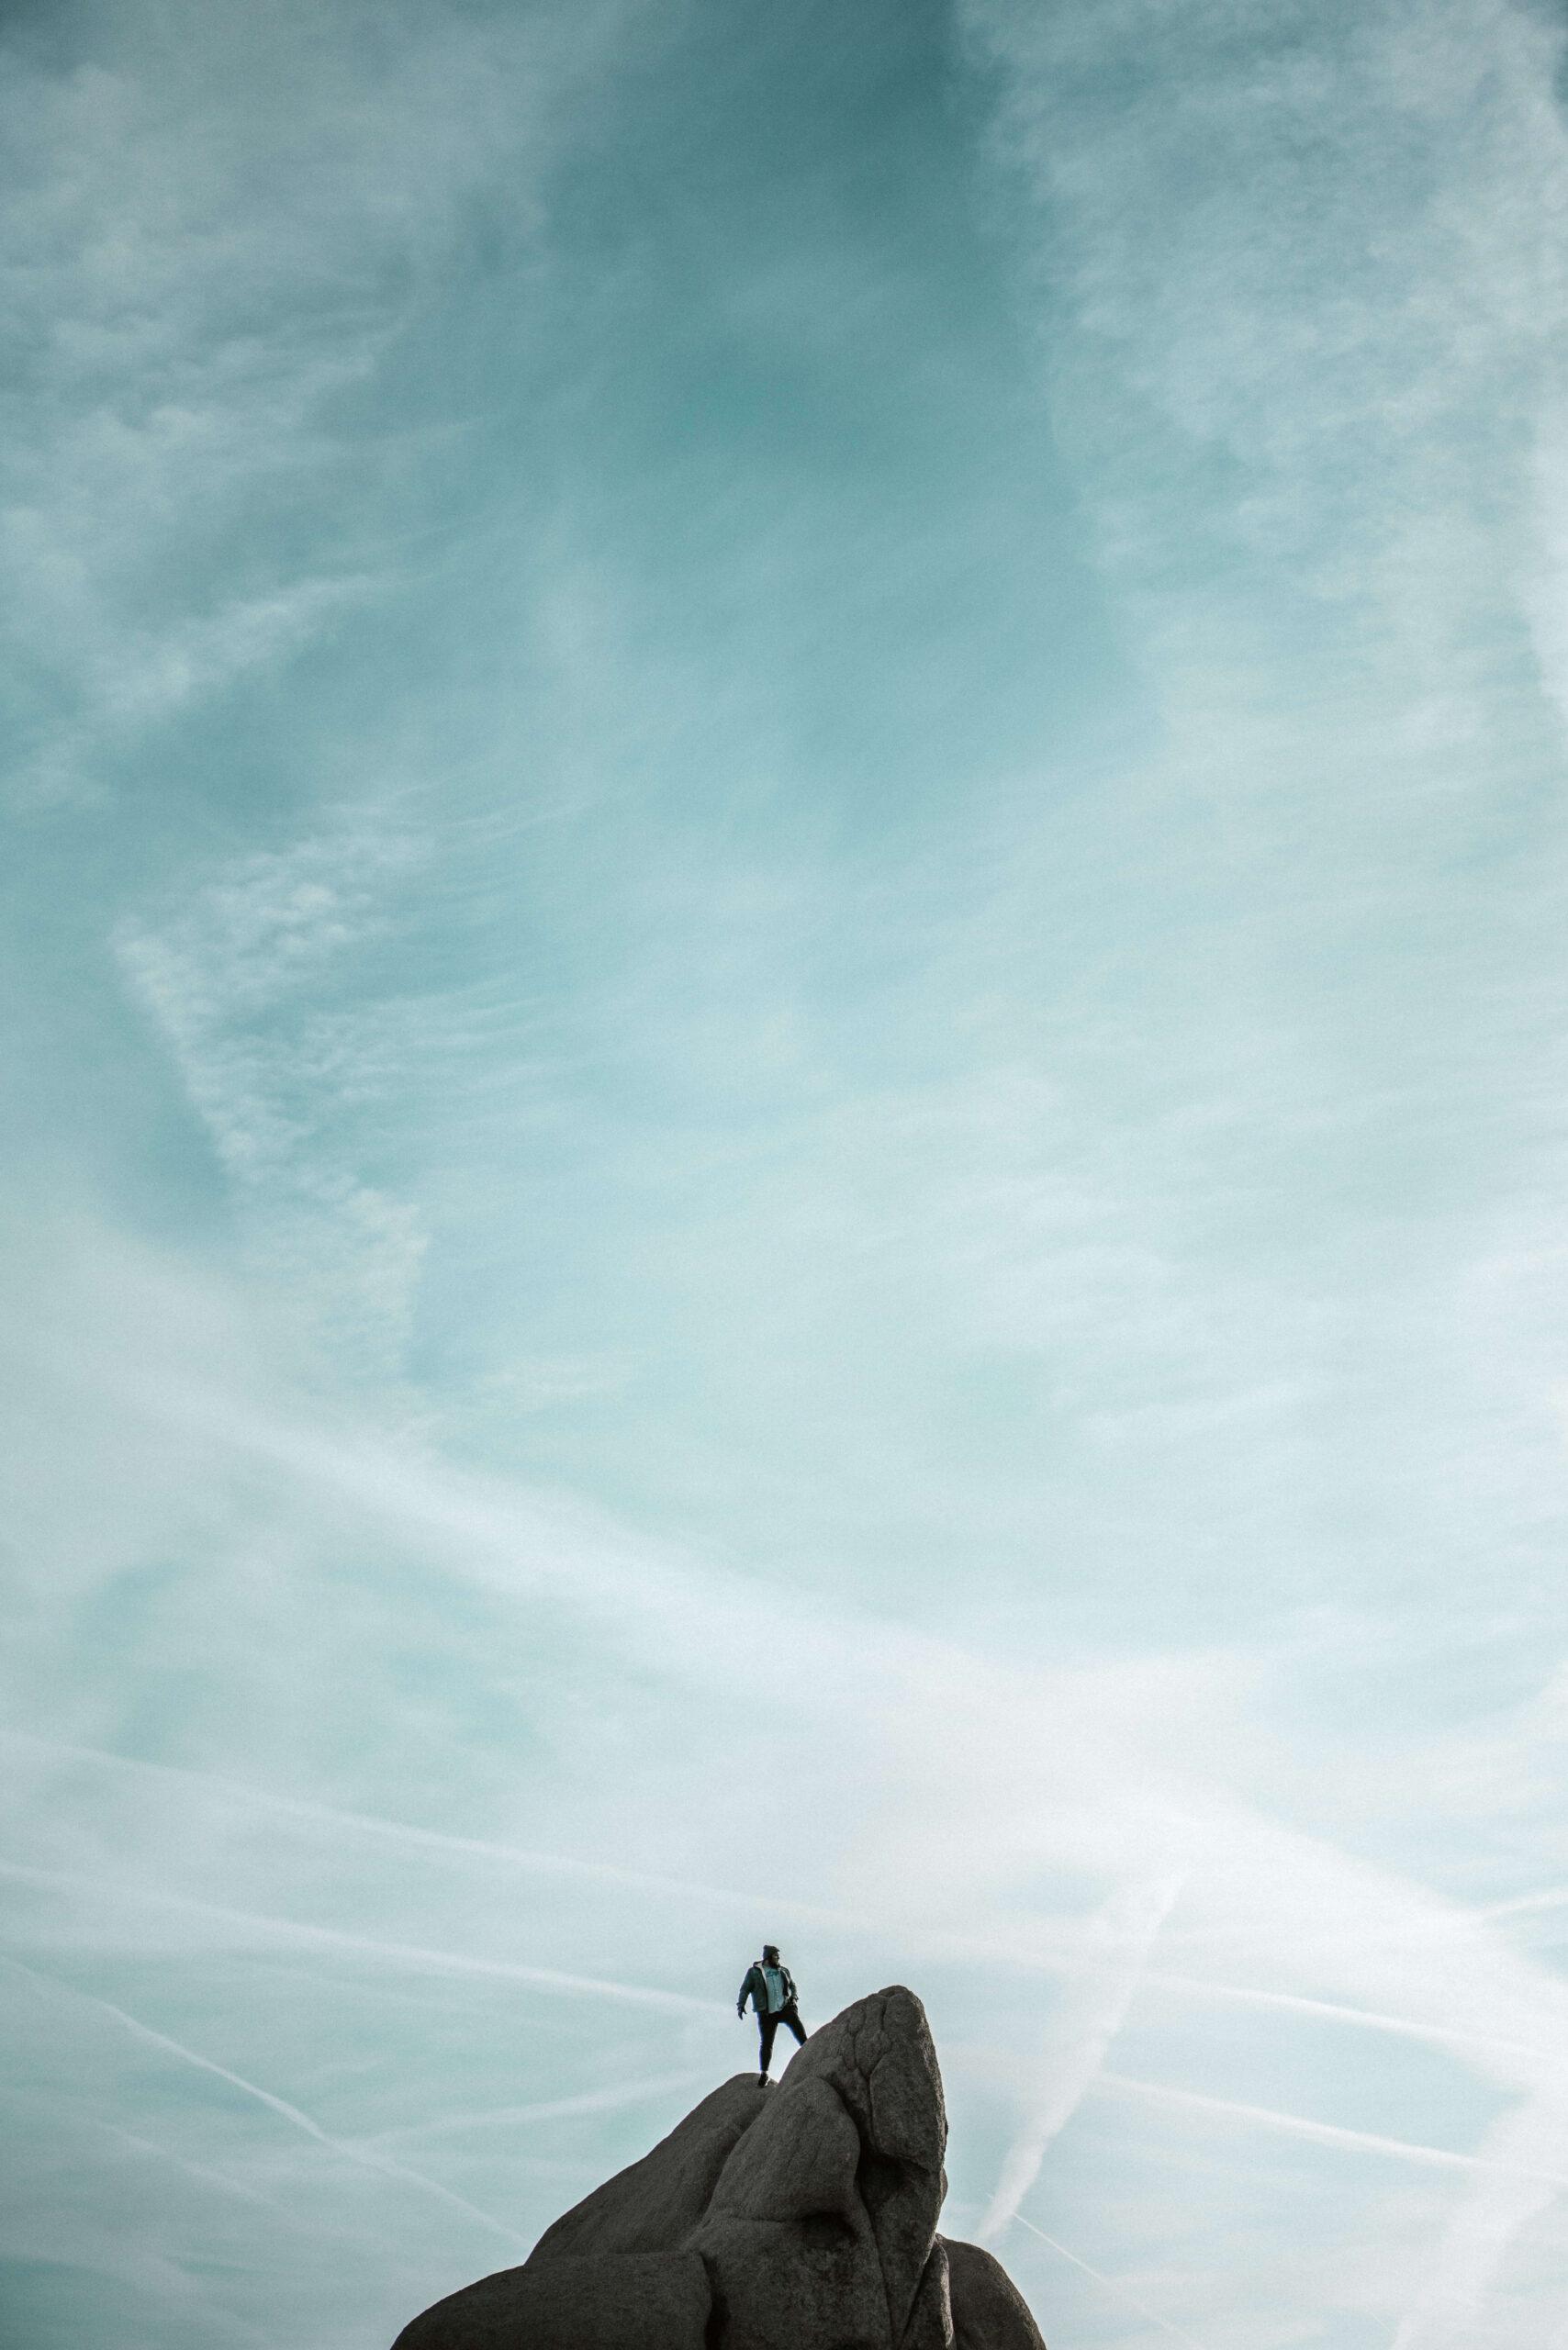 francisco-gonzalez-W_LMYDgAoAE-unsplash_retouched